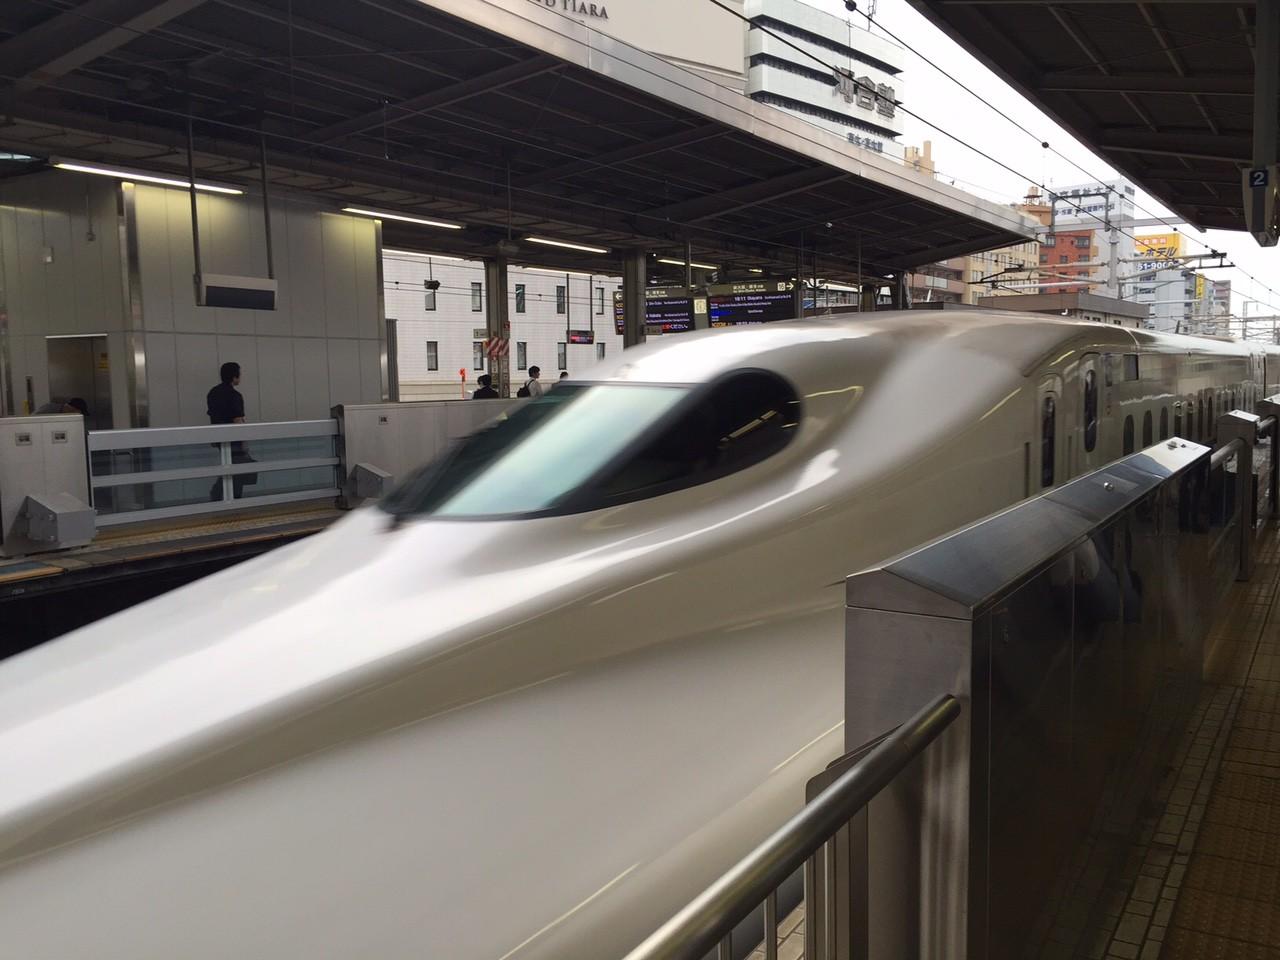 Shinkansen pulling into the station